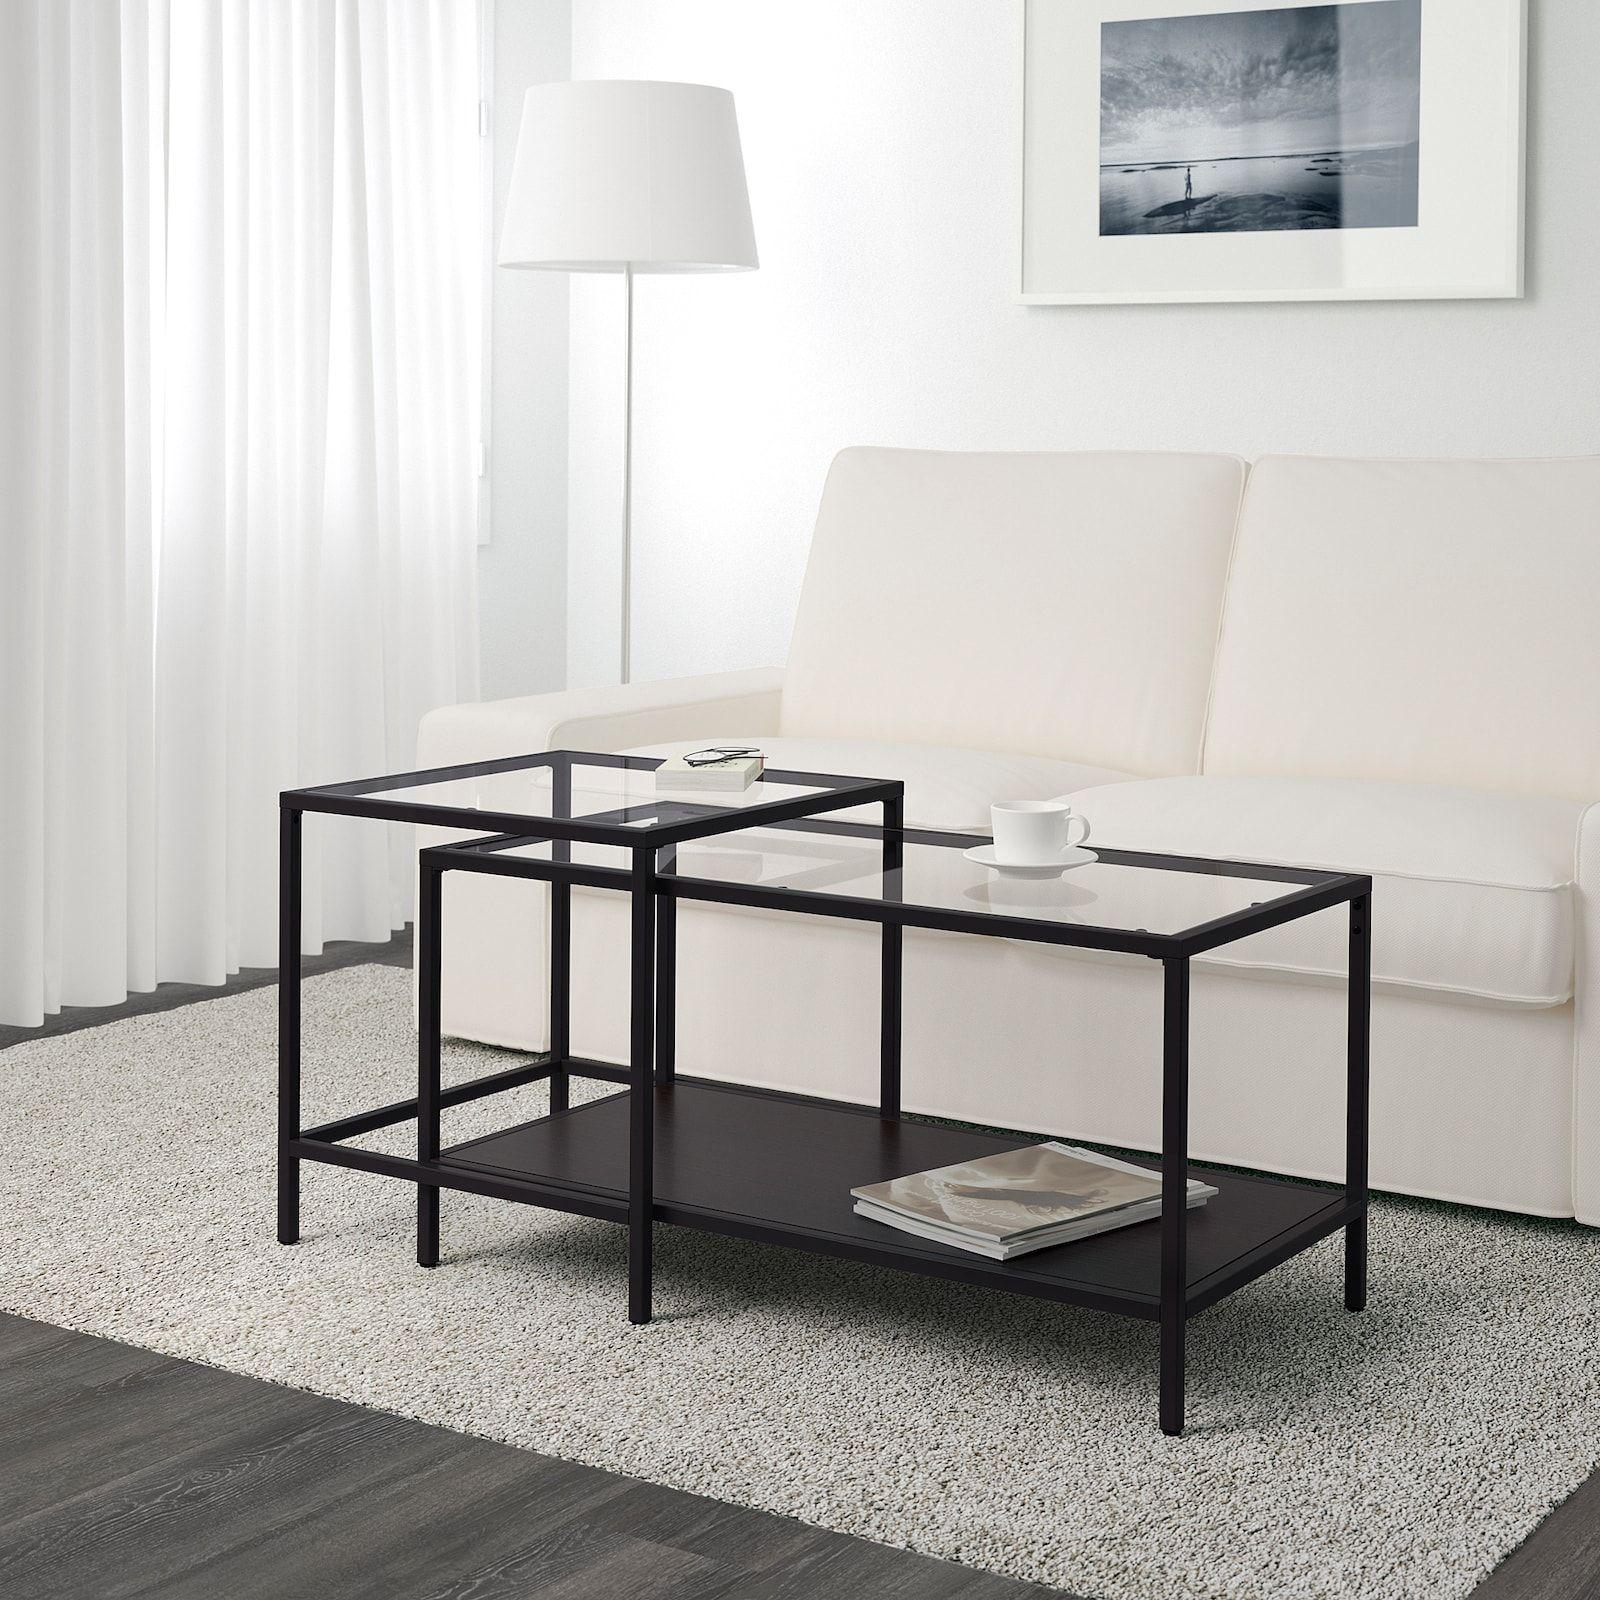 Ikea Us Furniture And Home Furnishings Ikea Coffee Table Ikea Side Table Side Table [ 2000 x 2000 Pixel ]